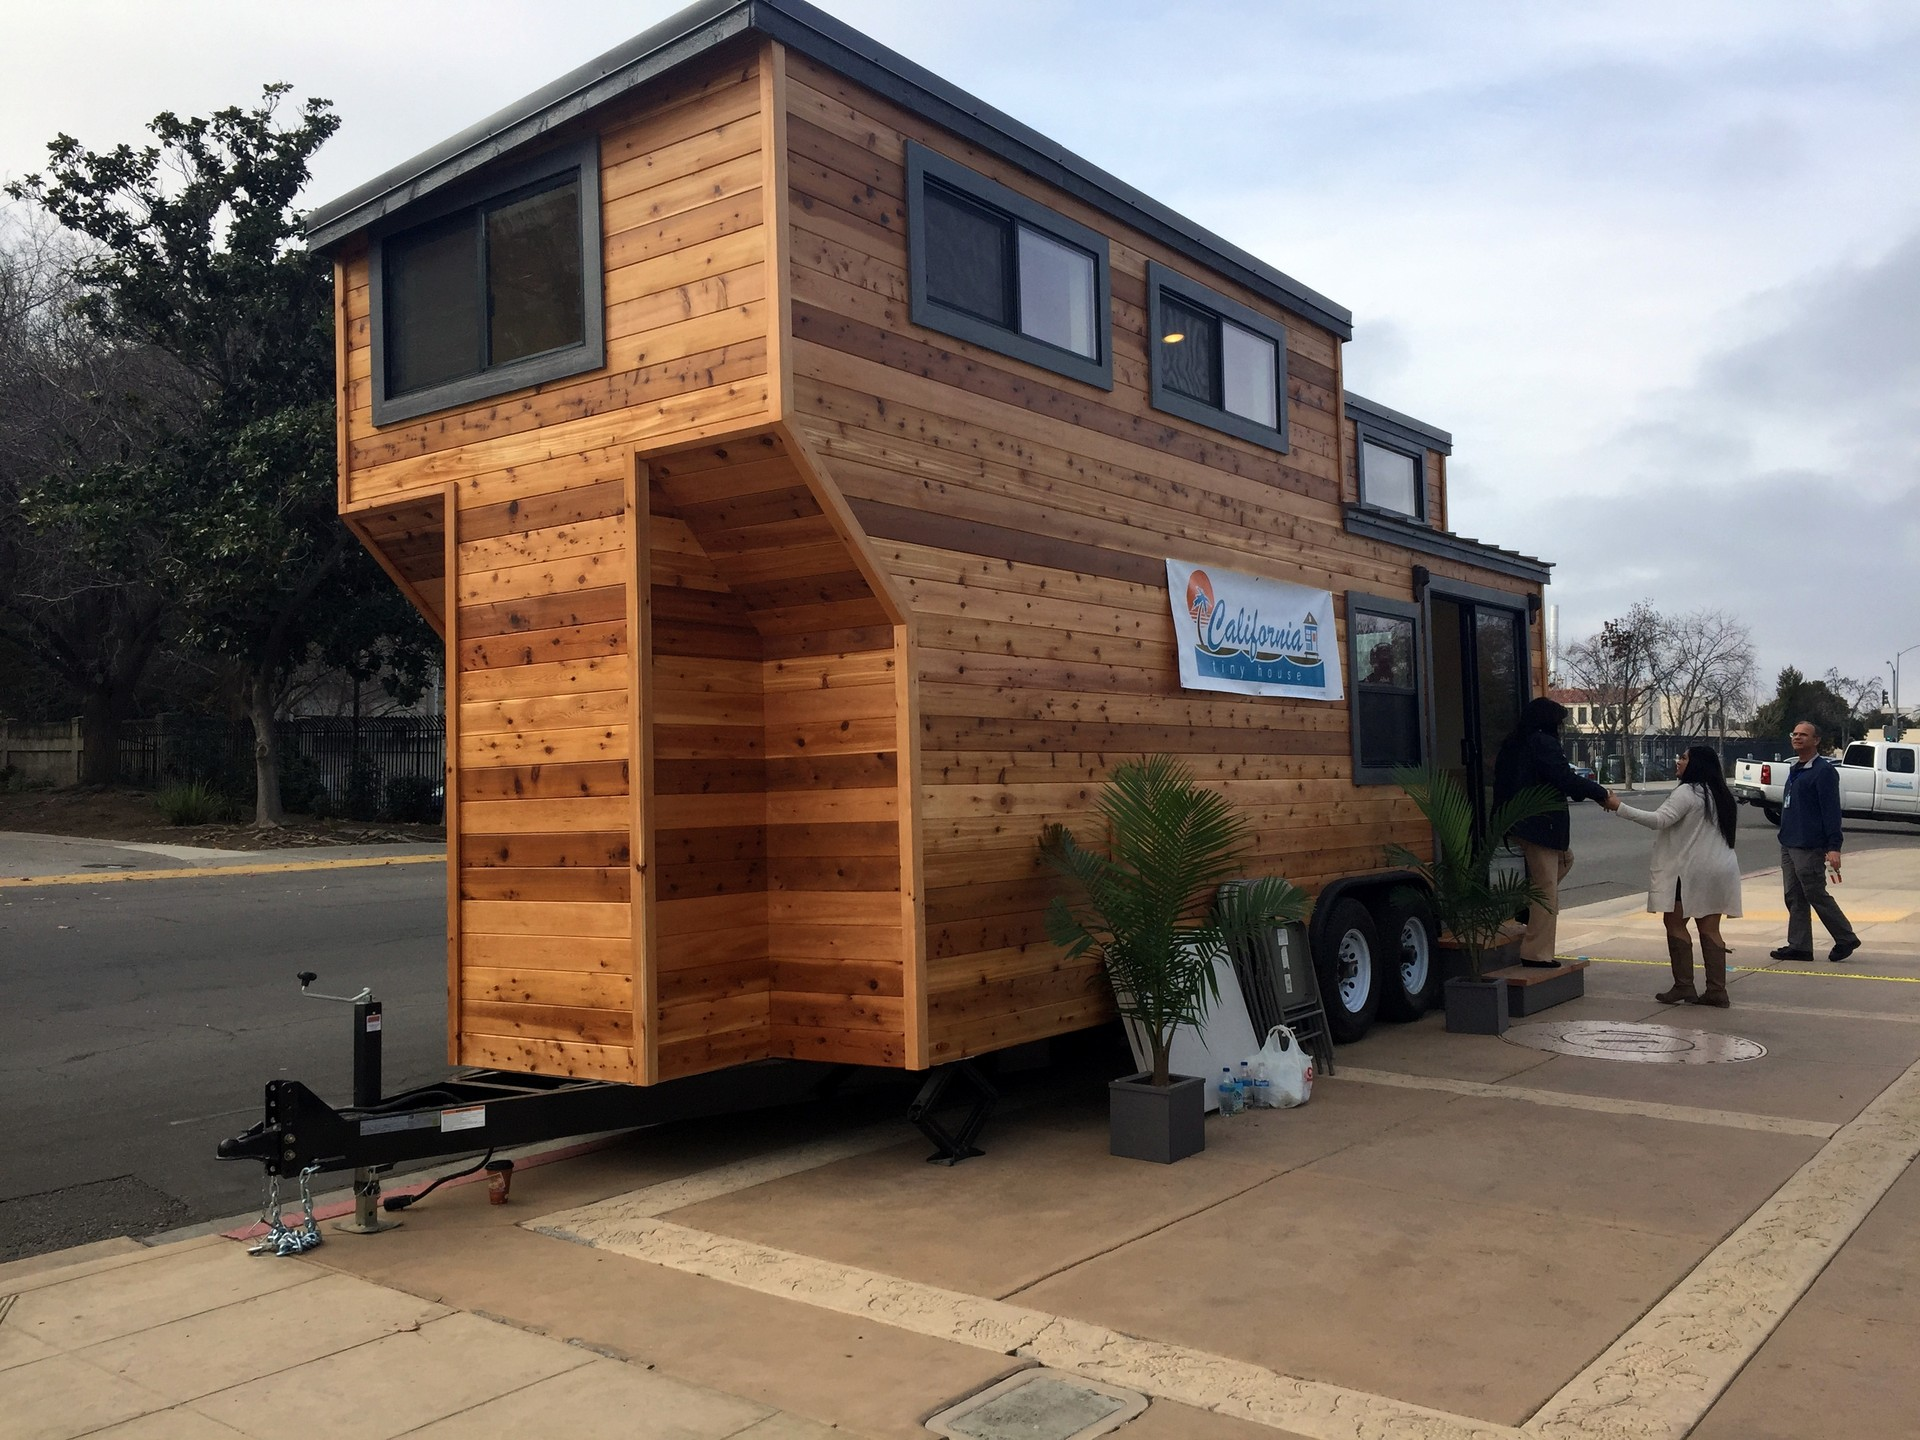 Fresno Passes Groundbreaking Tiny House Rules The